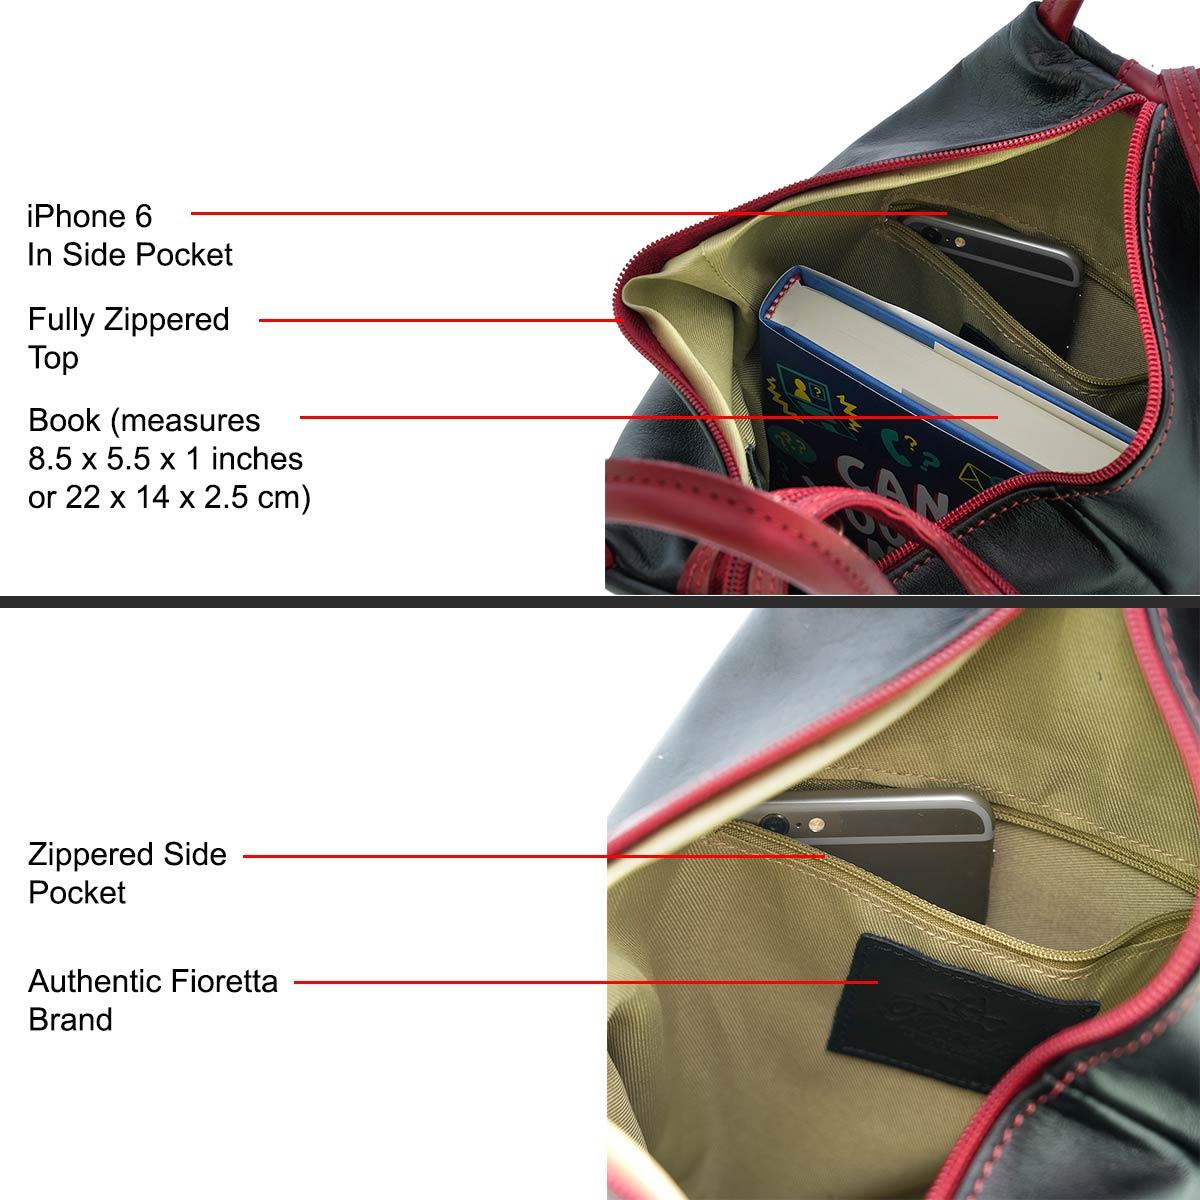 Fioretta Italian Genuine Leather Top Handle Backpack Purse Shoulder Bag Handbag Rucksack For Women - Black Red